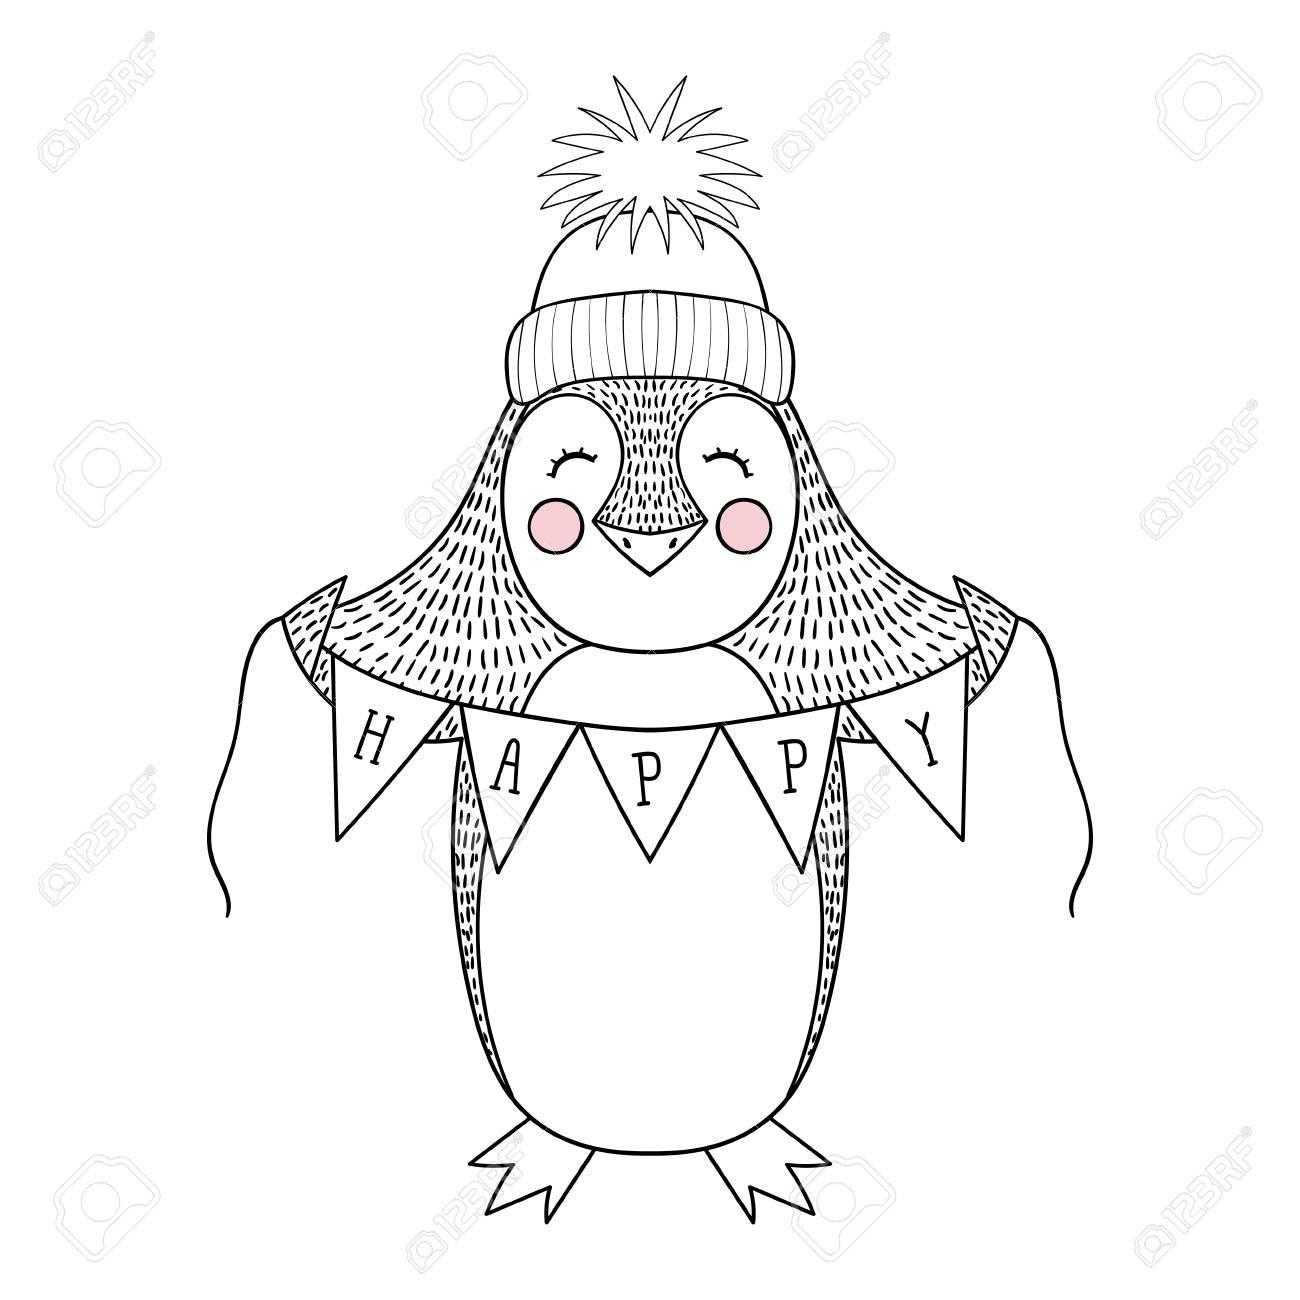 Historieta Dibujada Mano Divertida Del Pingüino Con La Bandera Feliz ...